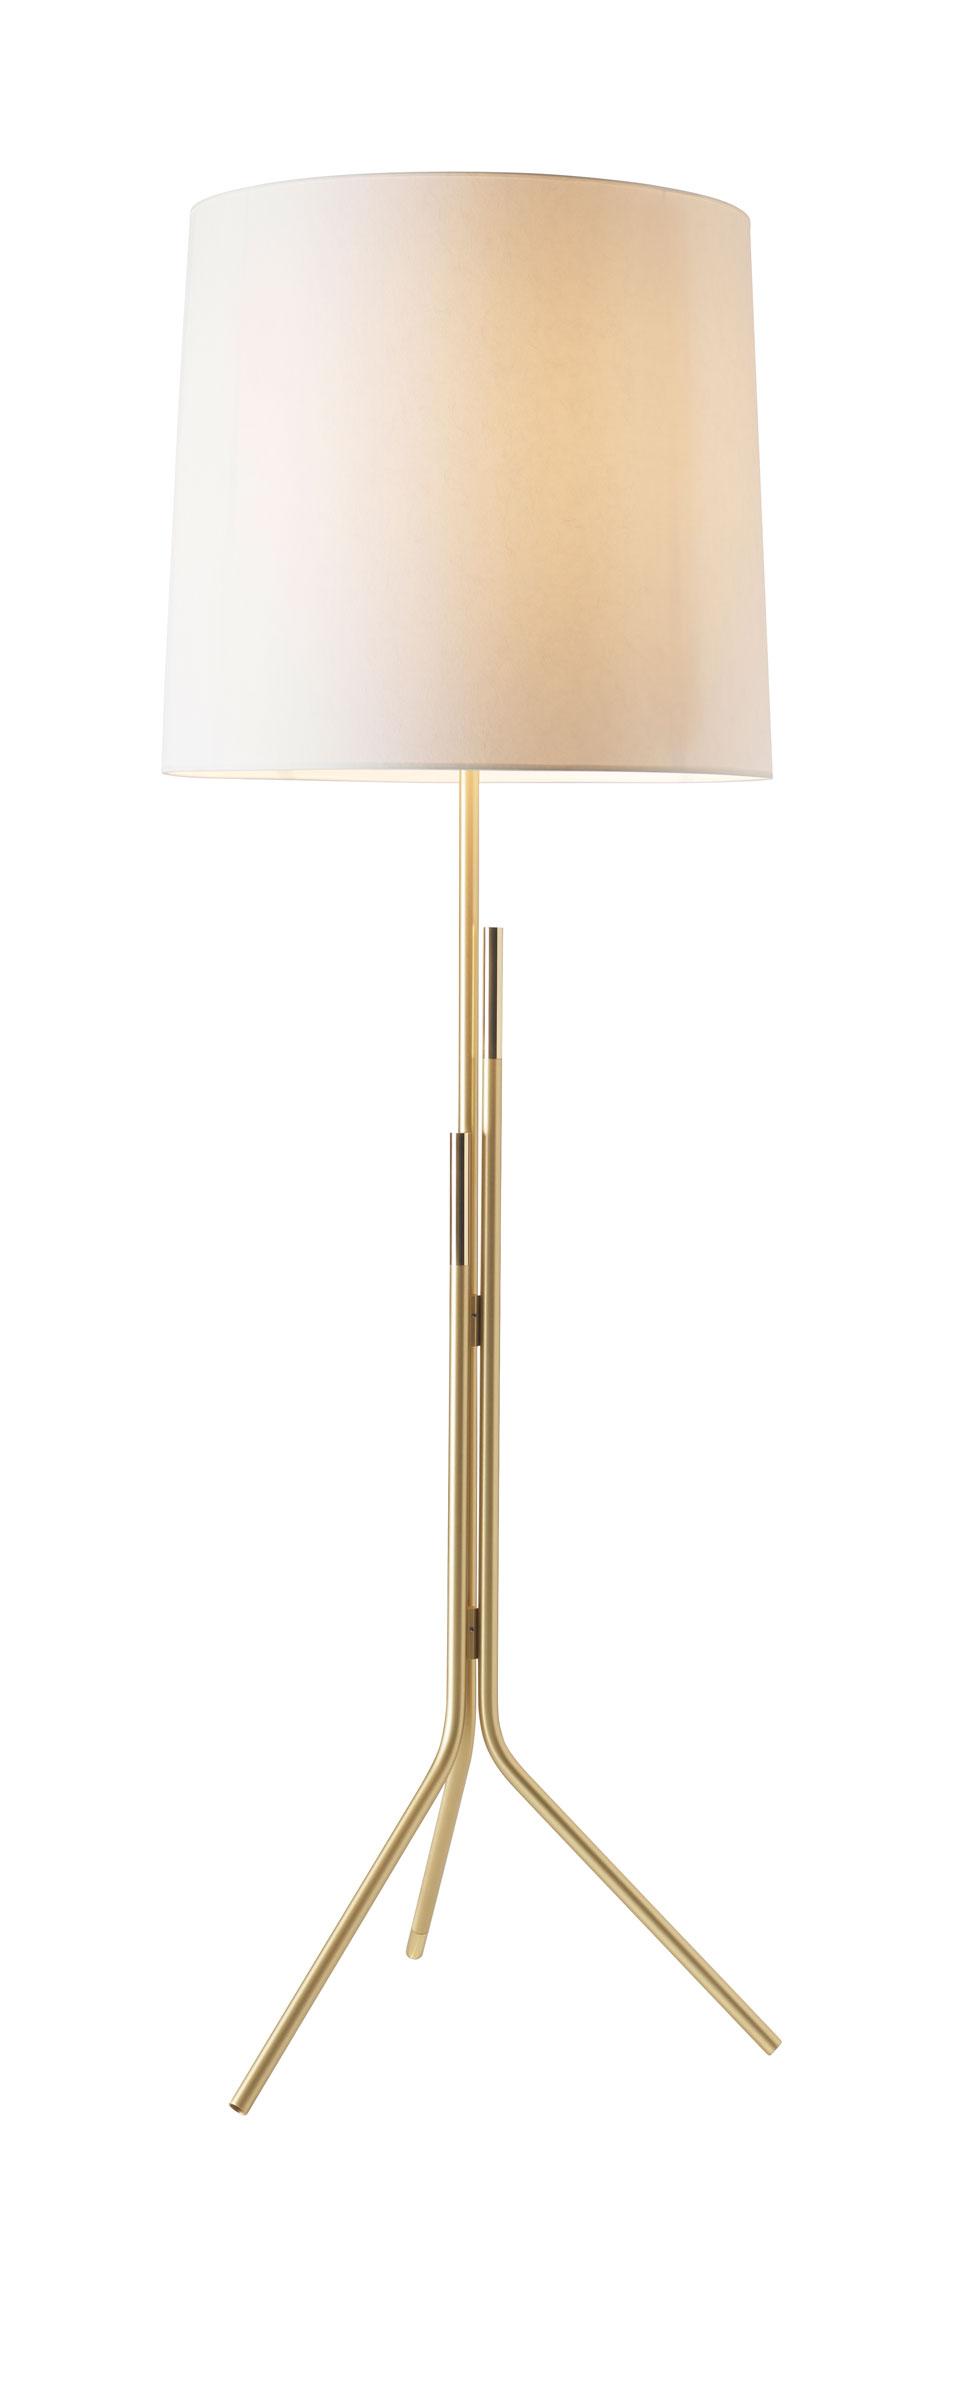 Lampadaire design, doré mat et brillant, Ellis. CVL Luminaires.